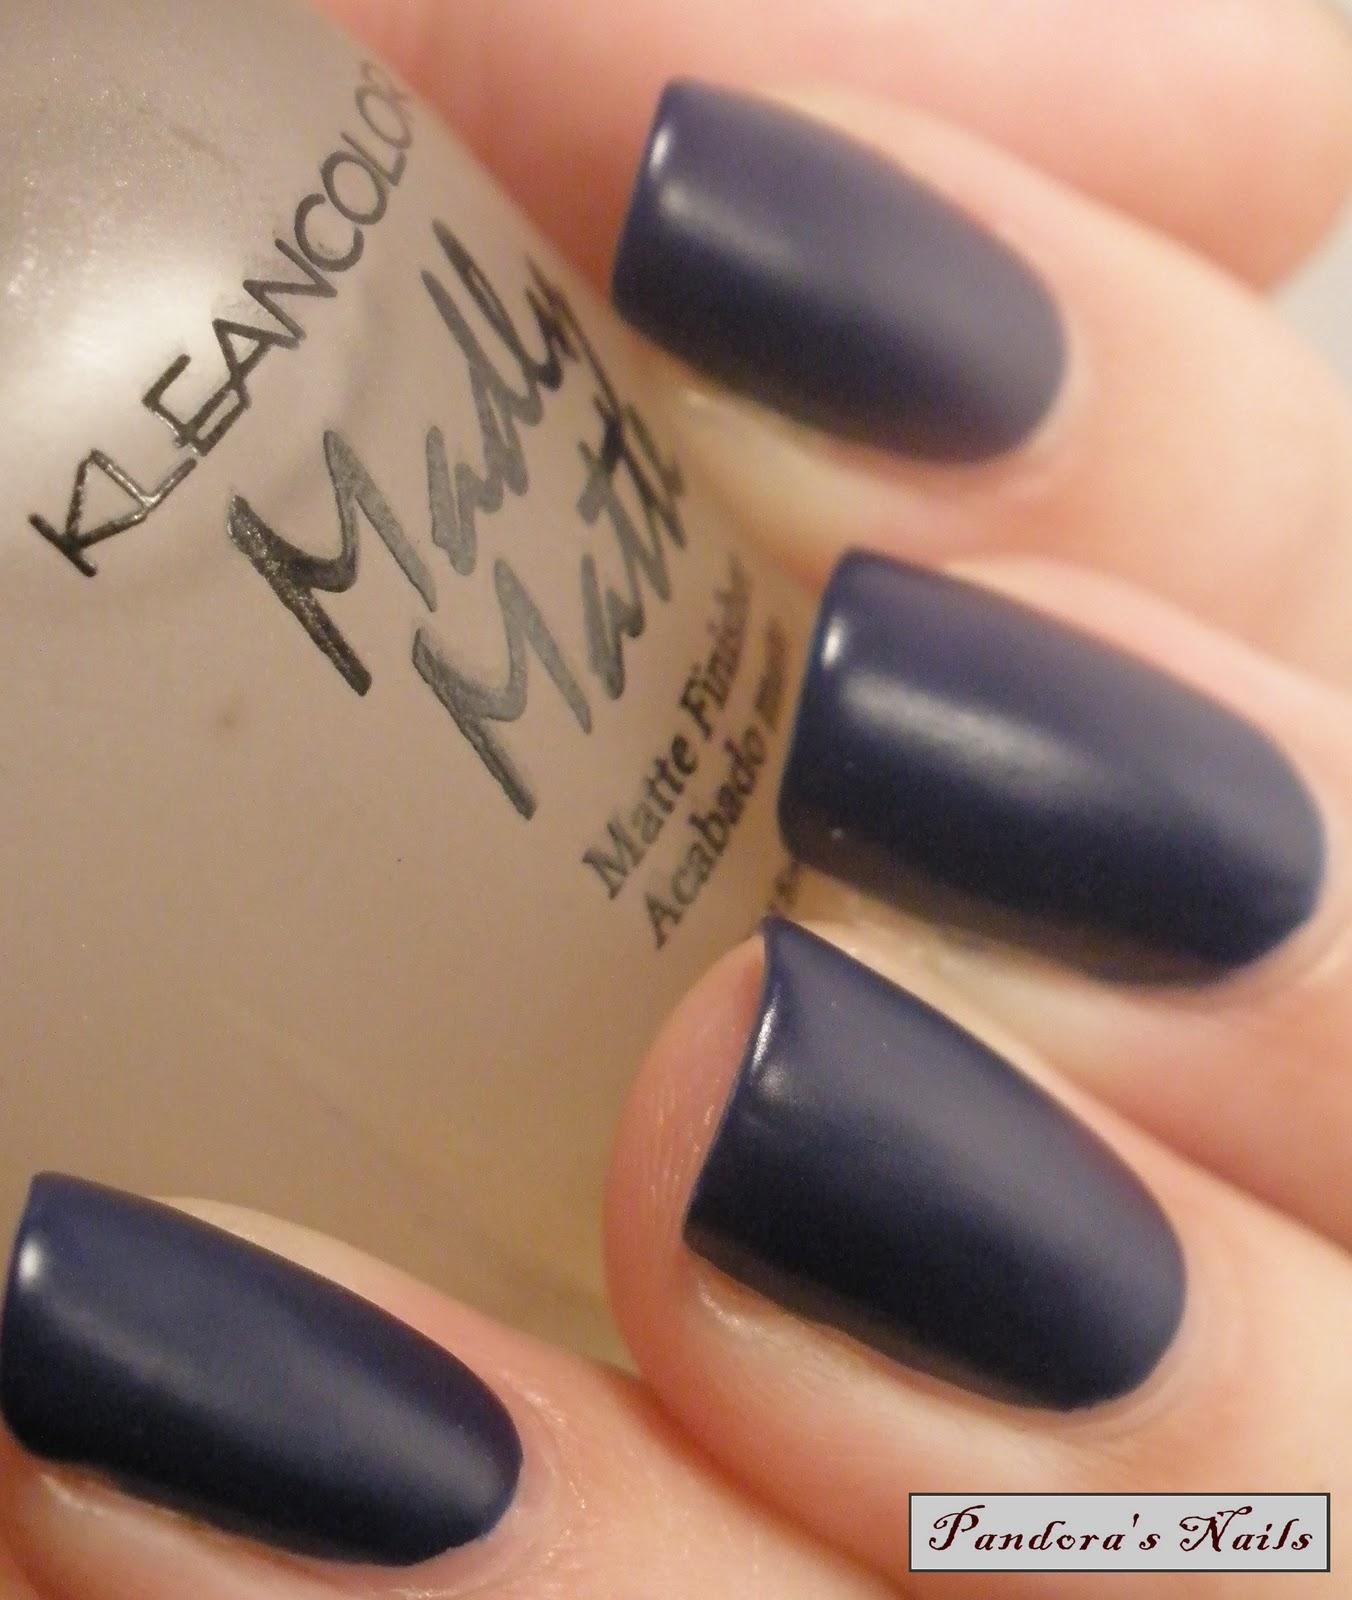 Pandora\'s Nails: Nails Inc Tudor Way